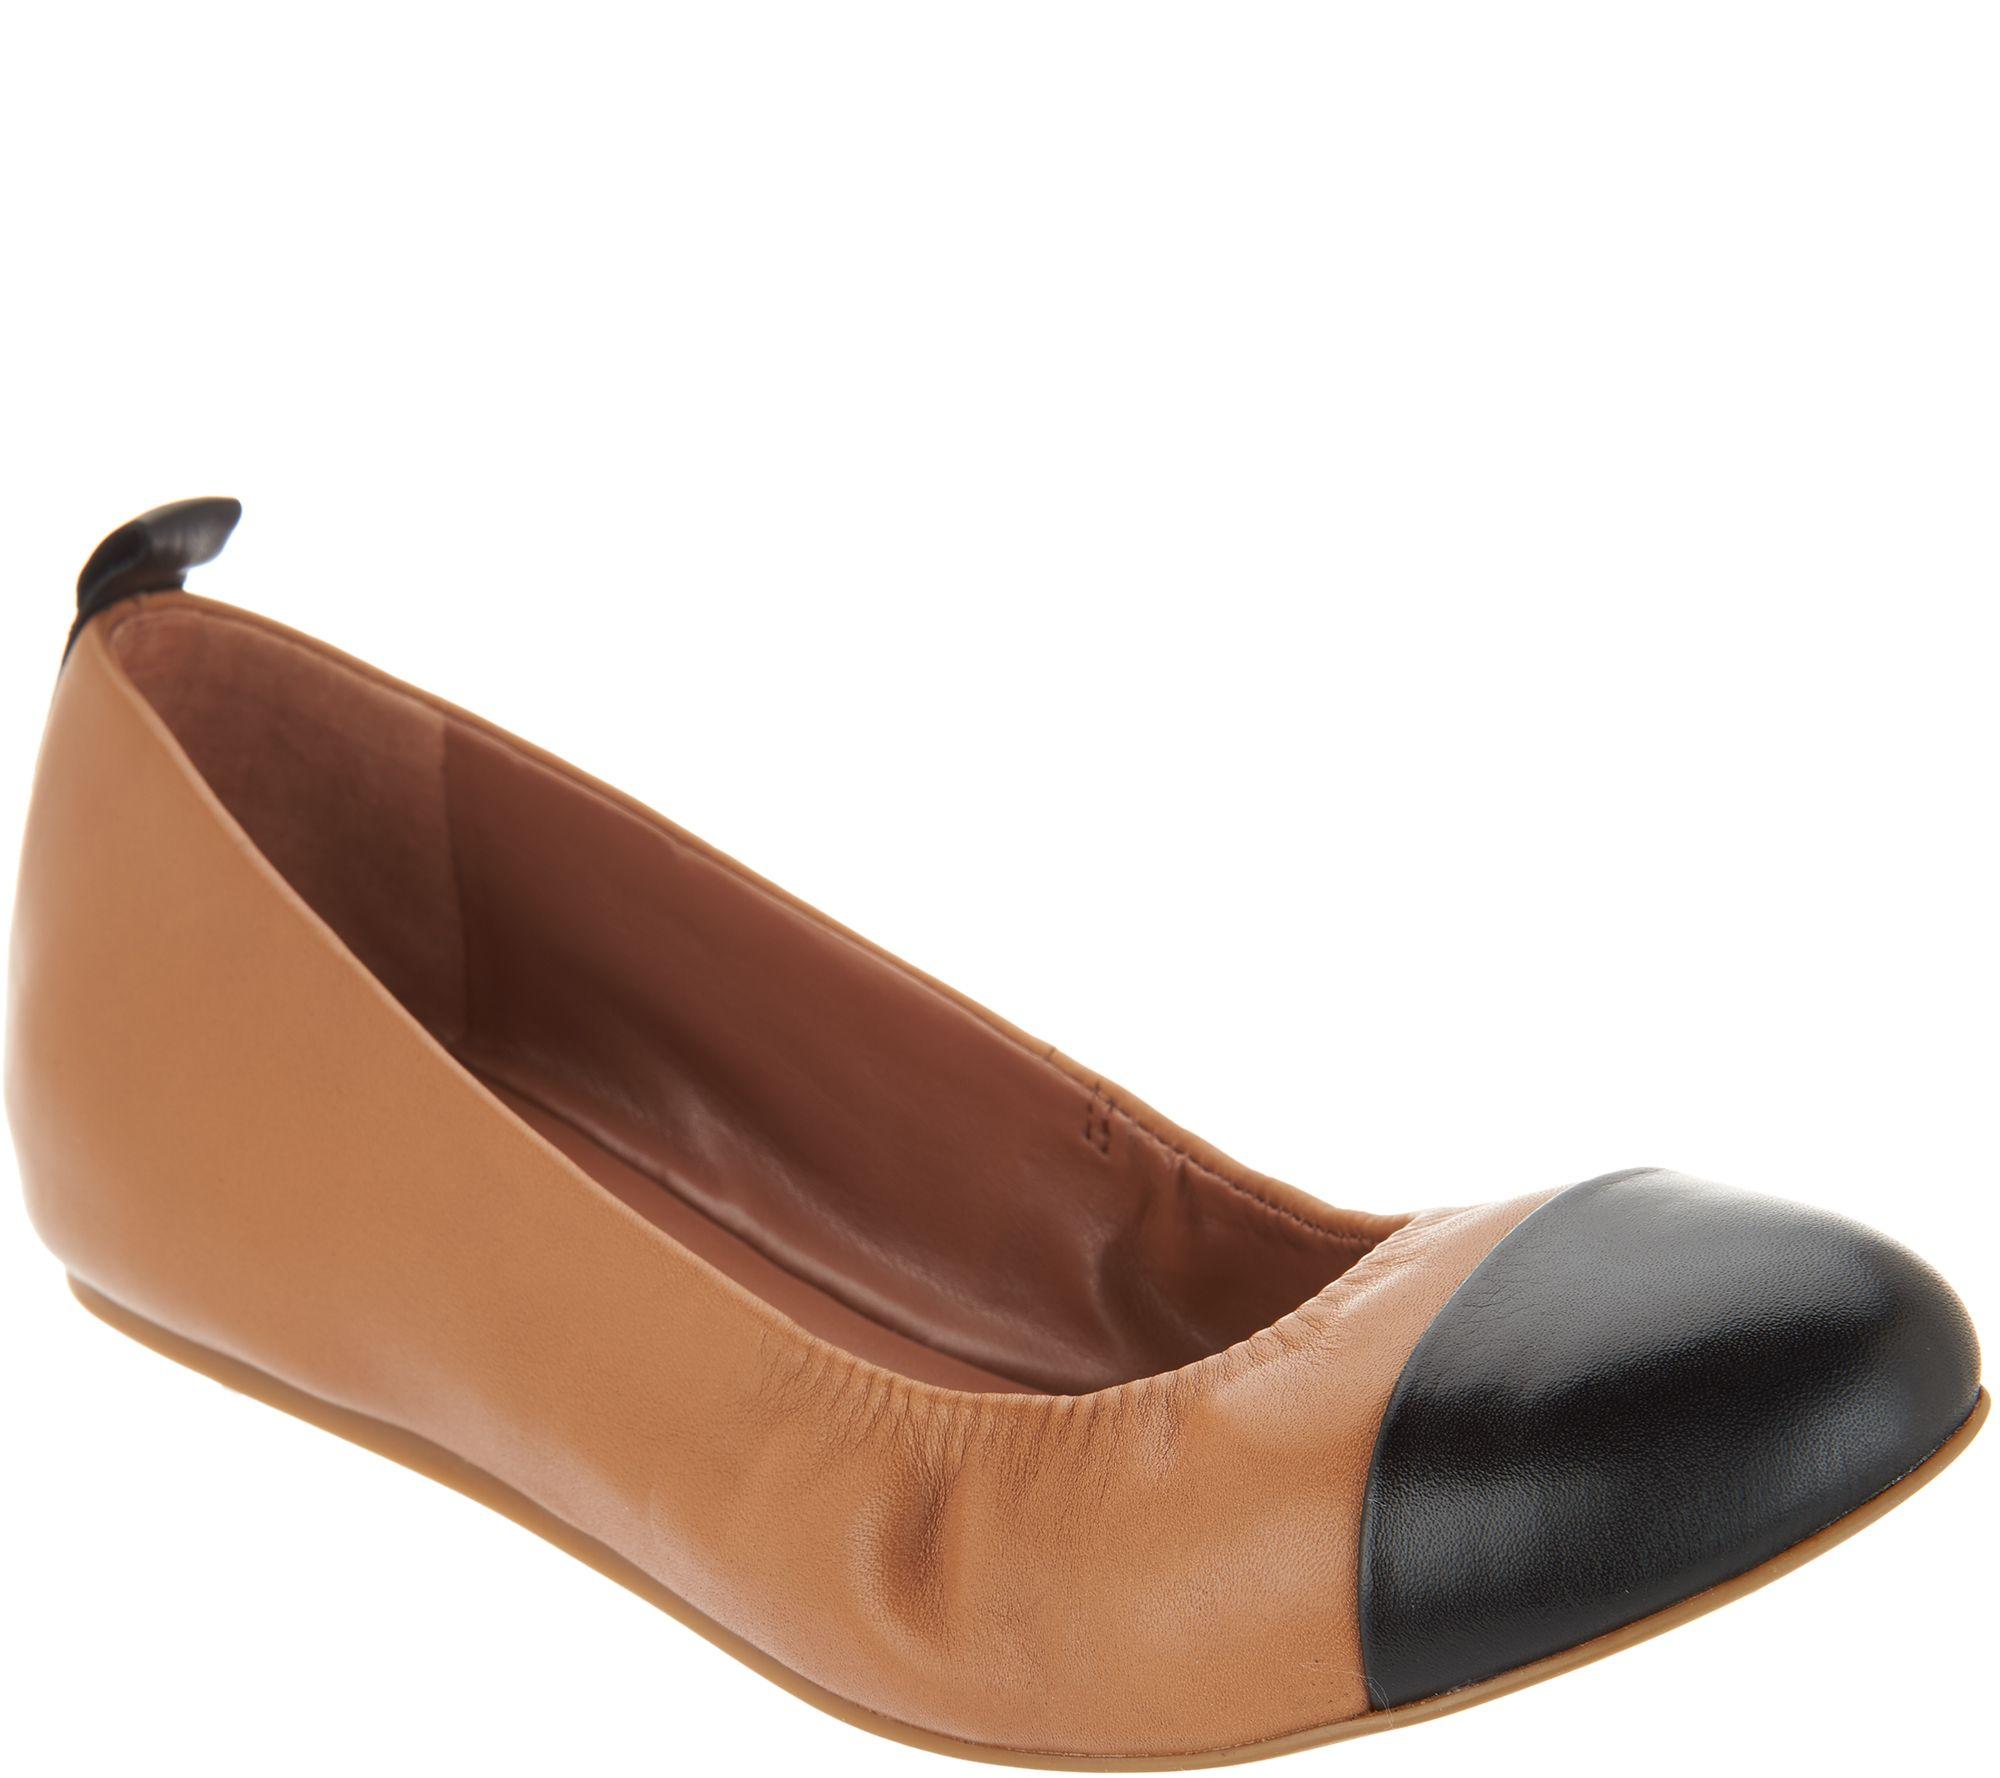 ED Ellen DeGeneres Ballet Flats - Lillianne - A300248